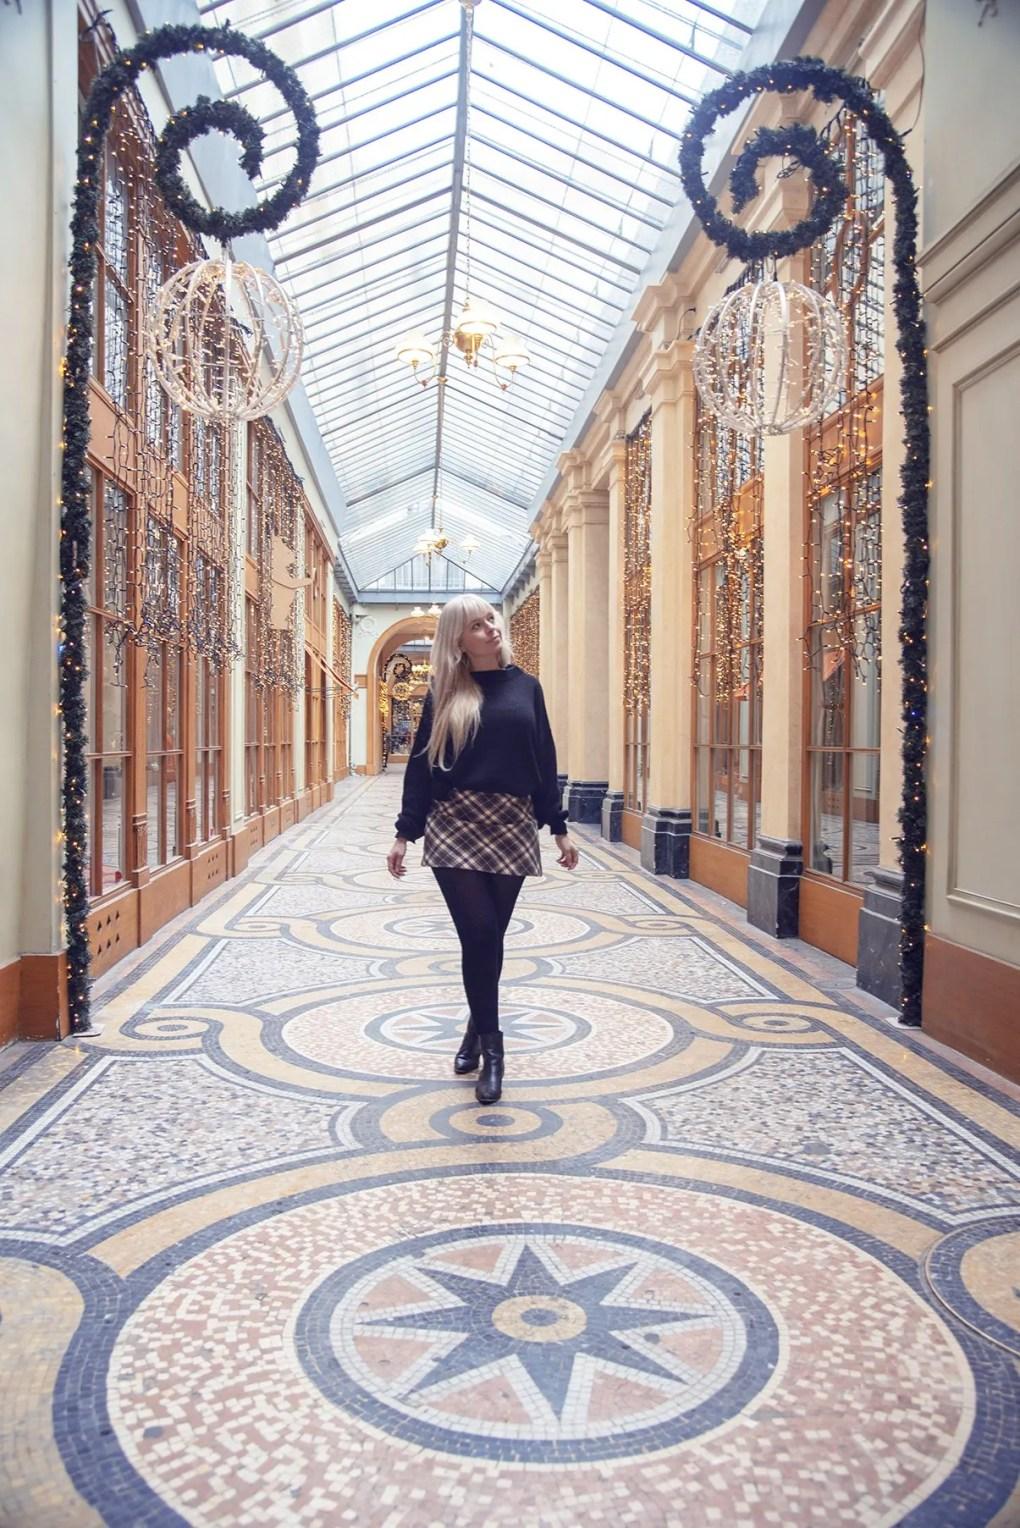 Galerie Vivienne, Parijs